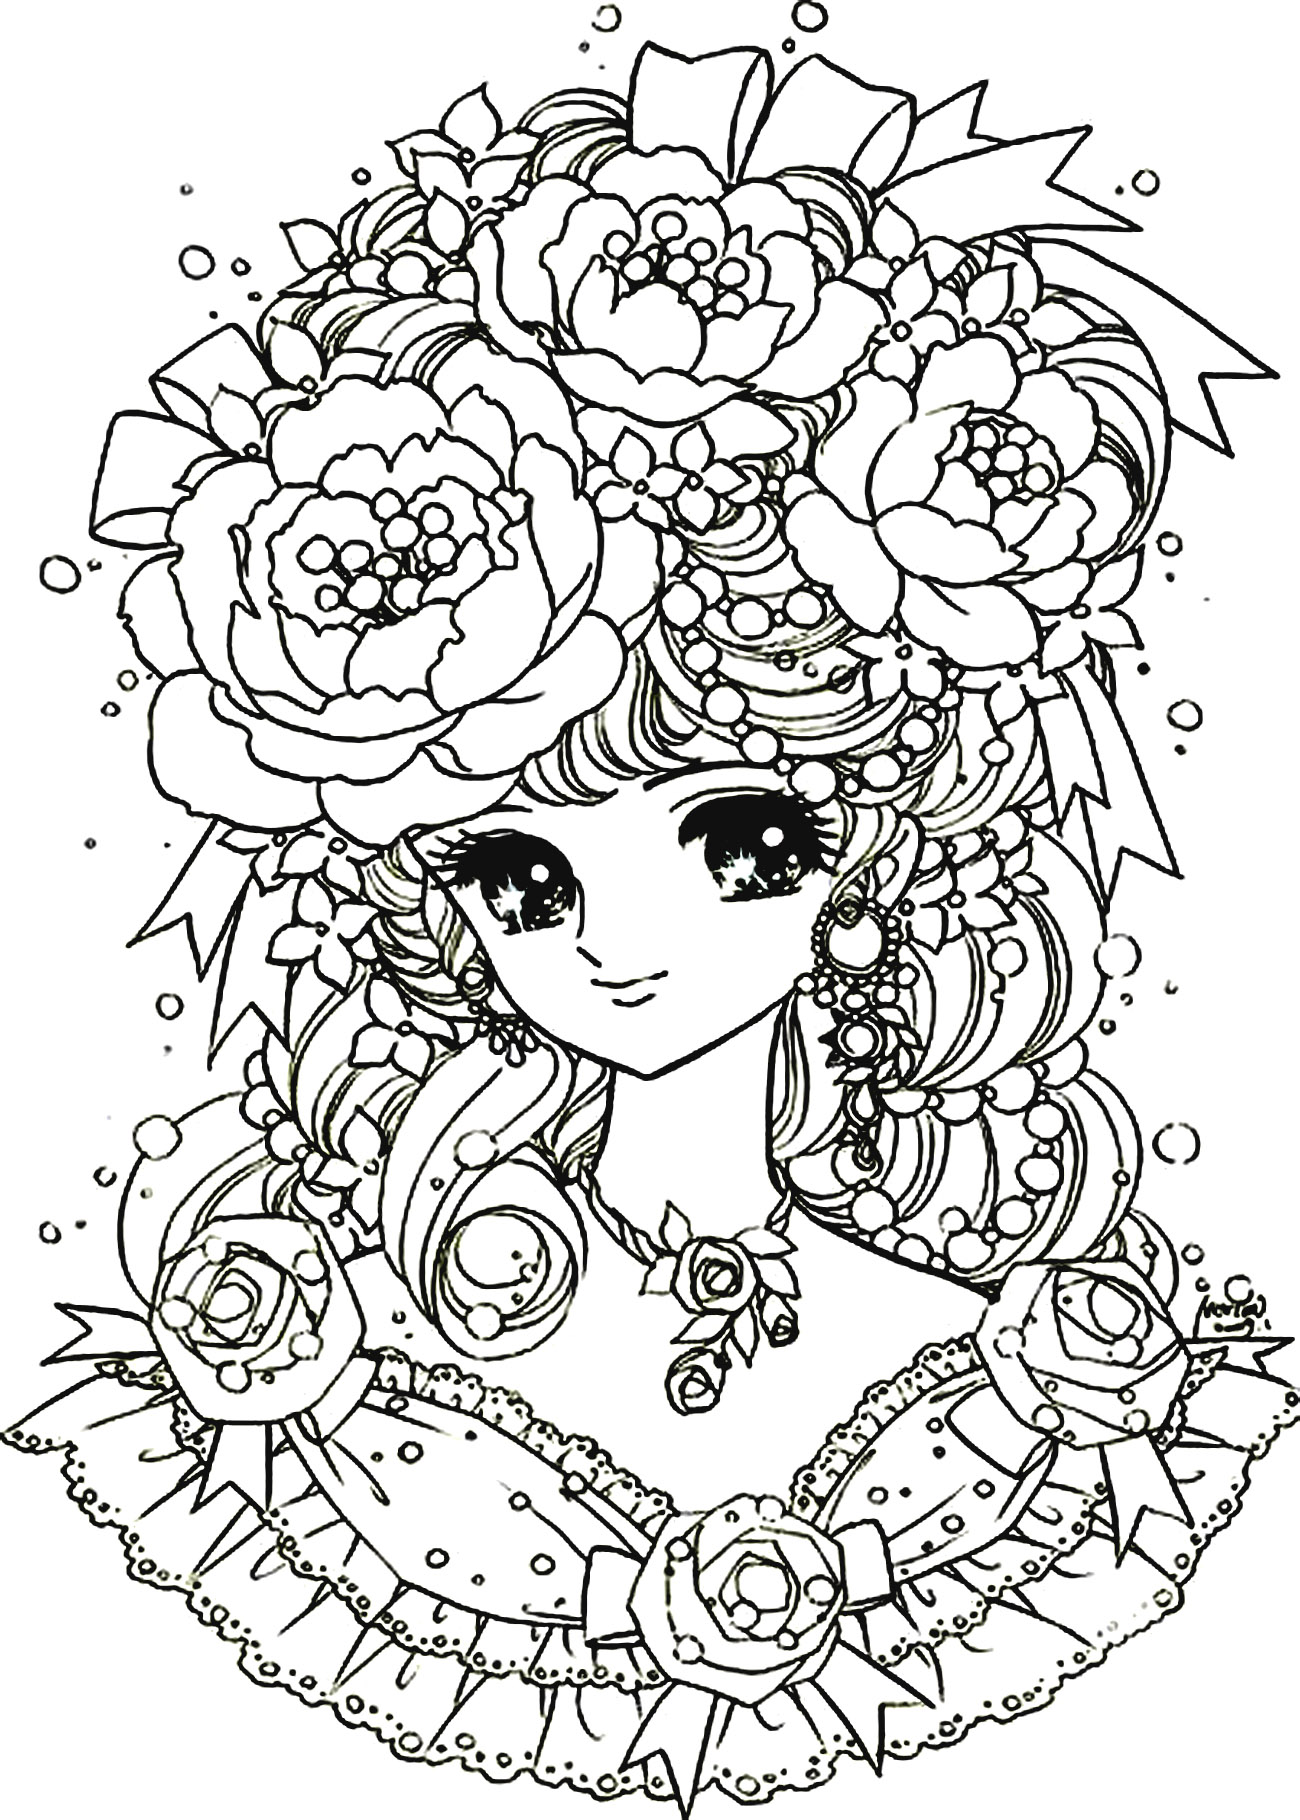 Manga flowers girl - Manga / Anime Adult Coloring Pages